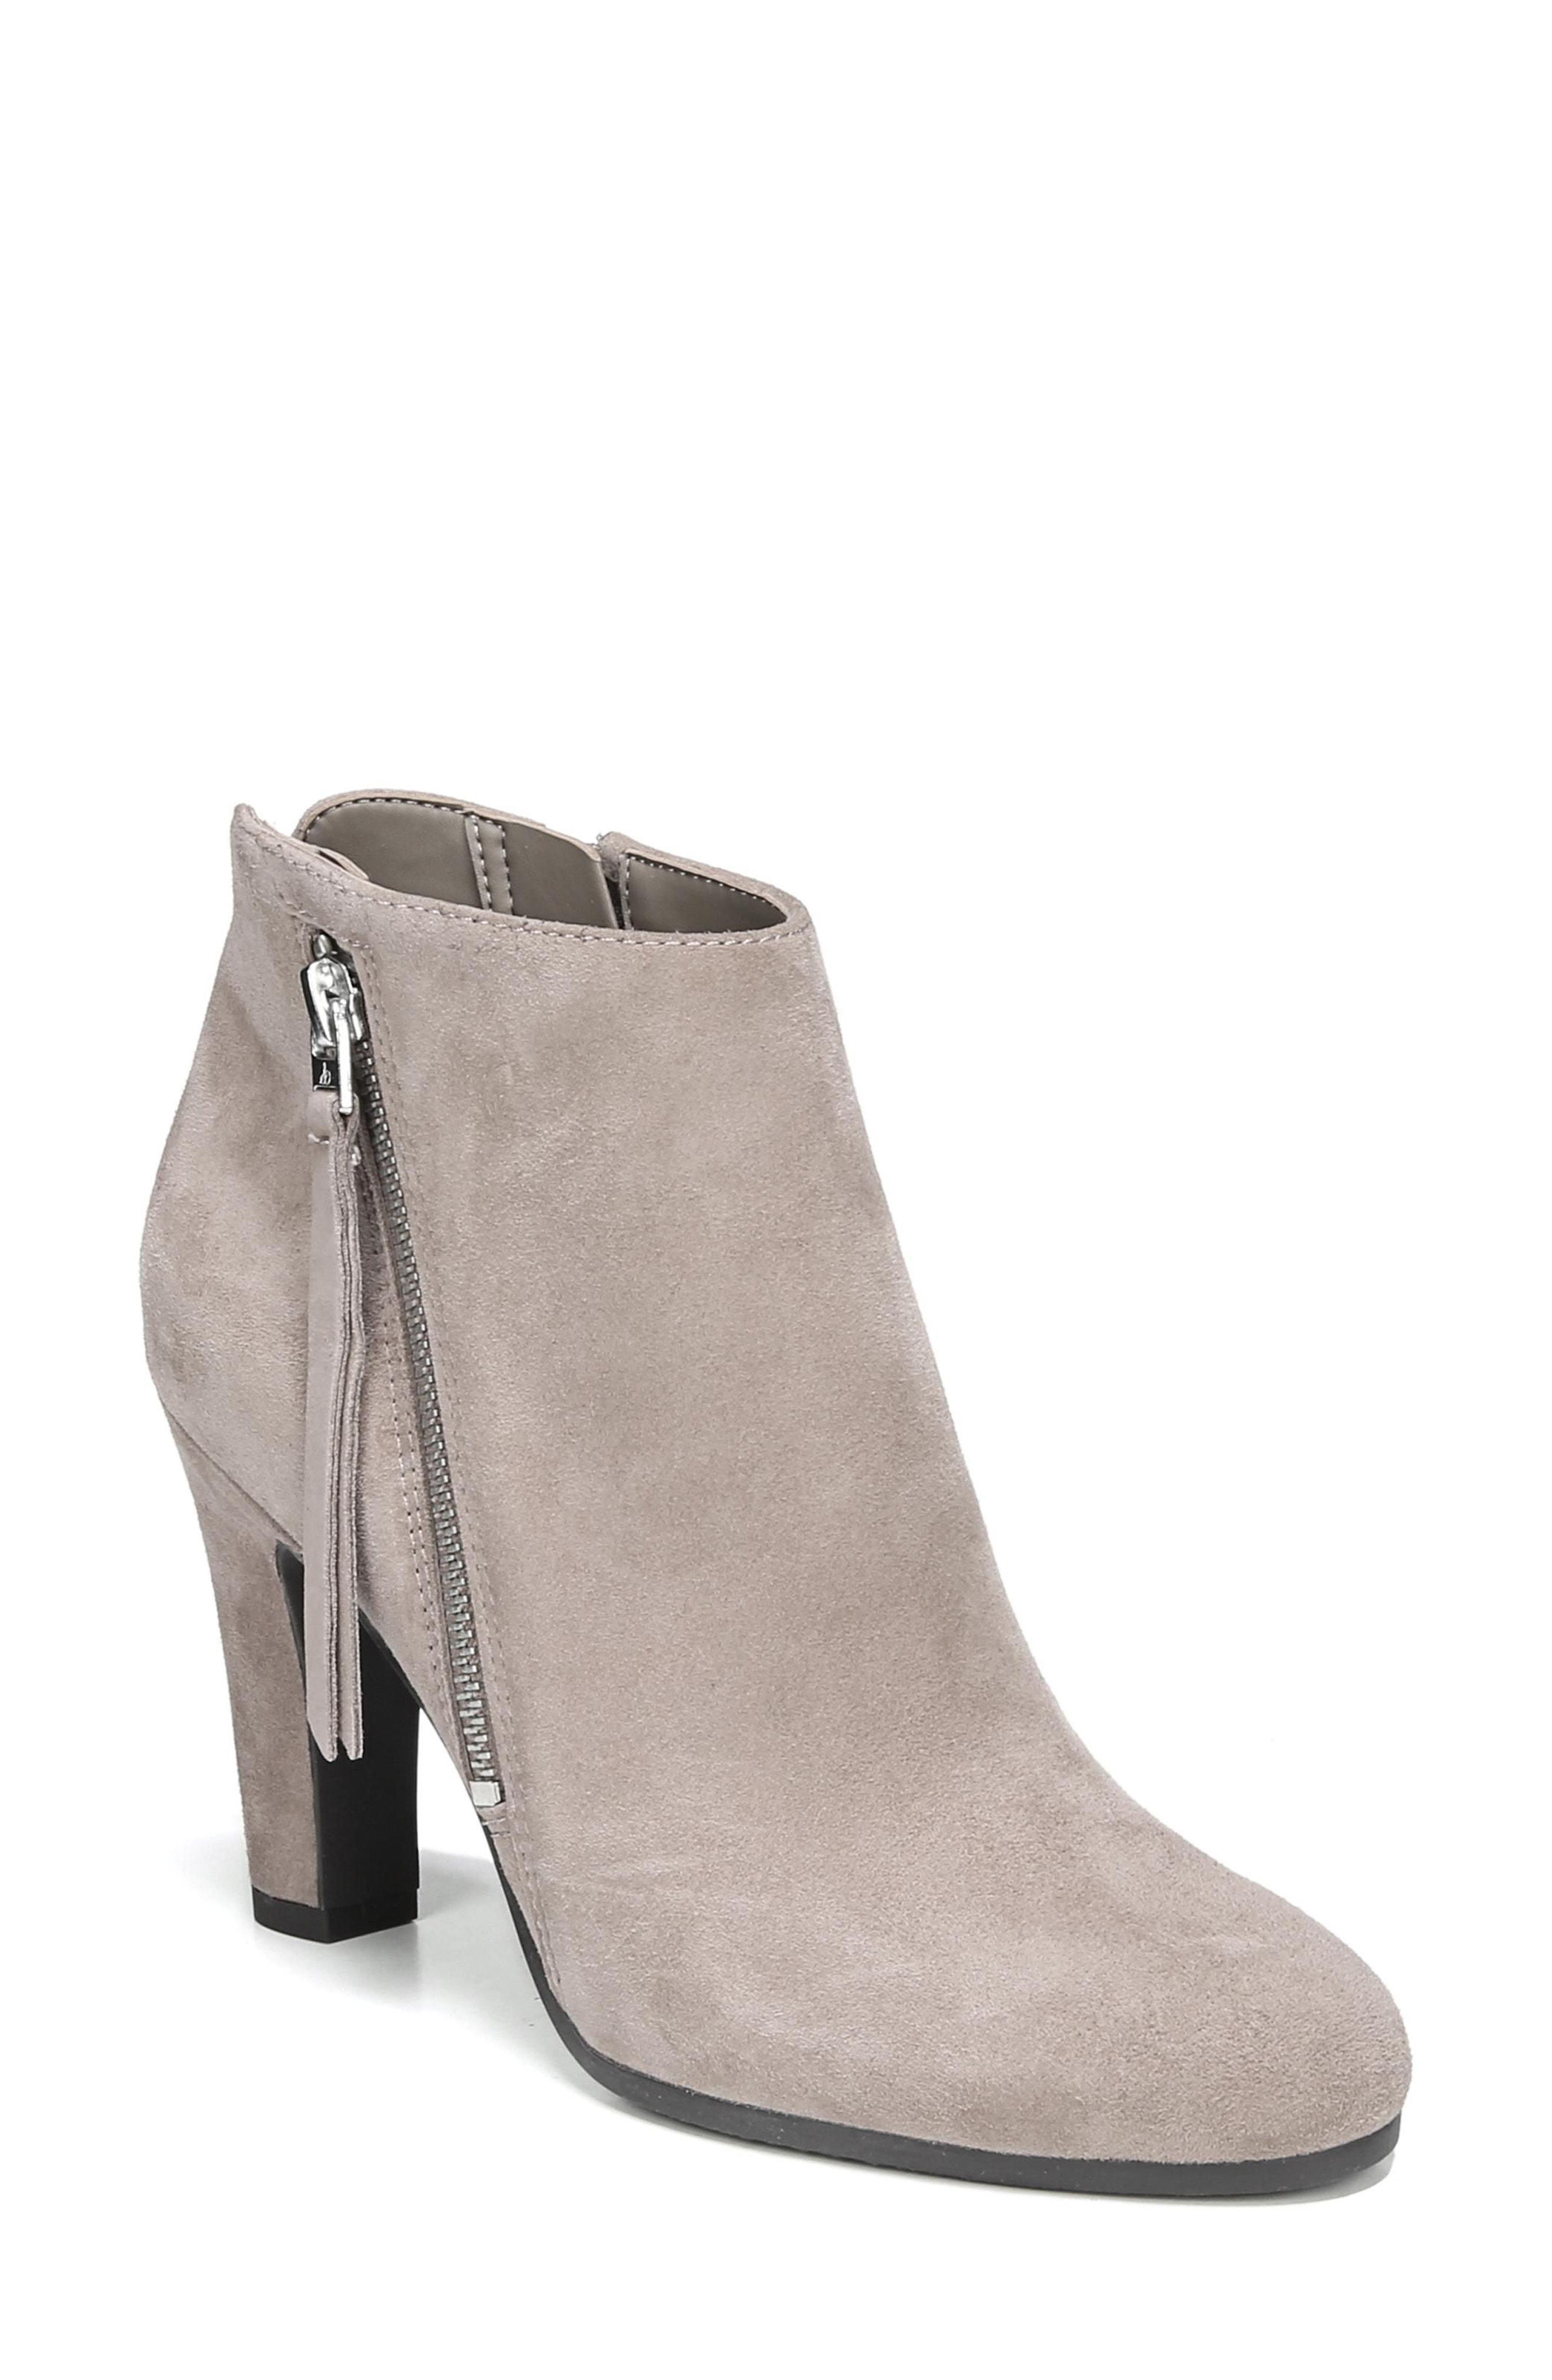 5d24c9e6d Lyst - Sam Edelman Sadee Angle Zip Bootie in Gray